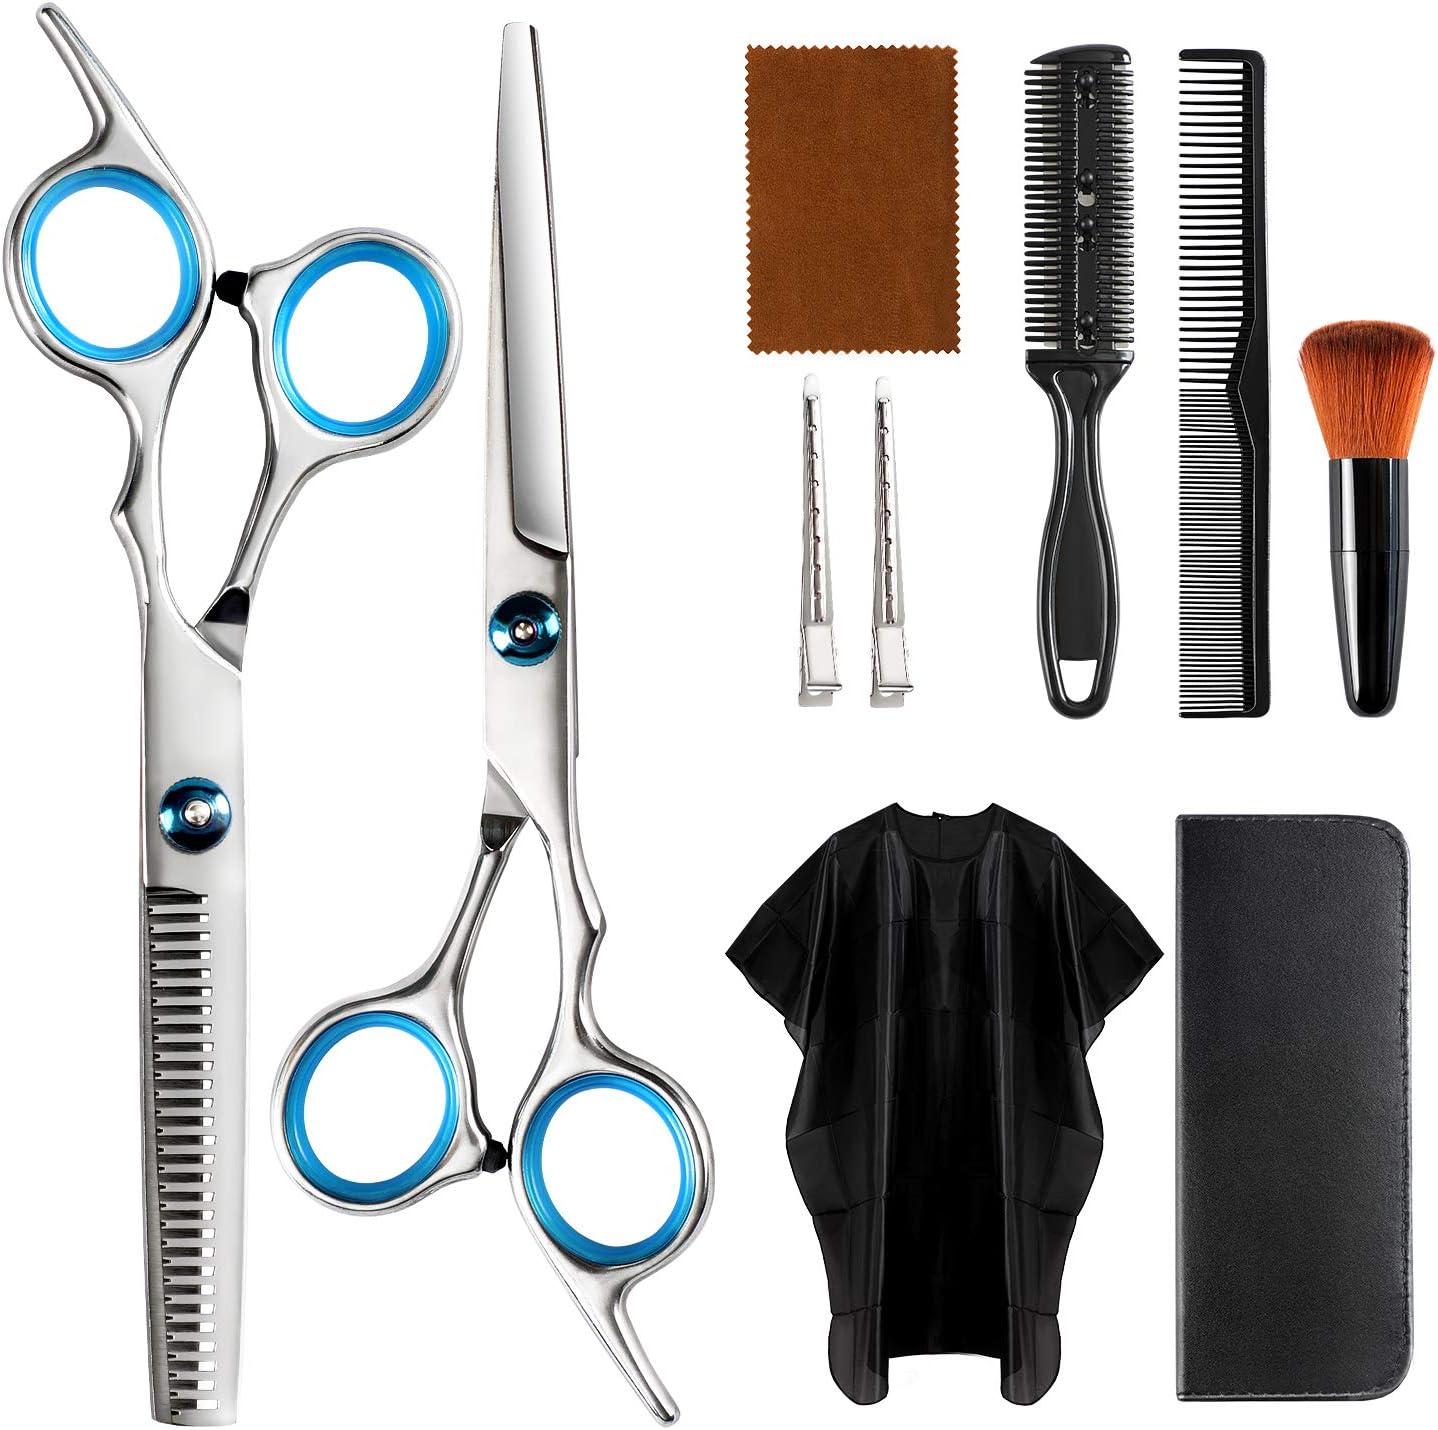 Hair Cutting Scissors Kit, Professional Barber Hair Cut Tools for Men Women Adults Kids Pet, Home Self Haircut Salon, Stainless Steel Thinning Shears, Razor Comb, Cape Cloak, Clips, Brush Set